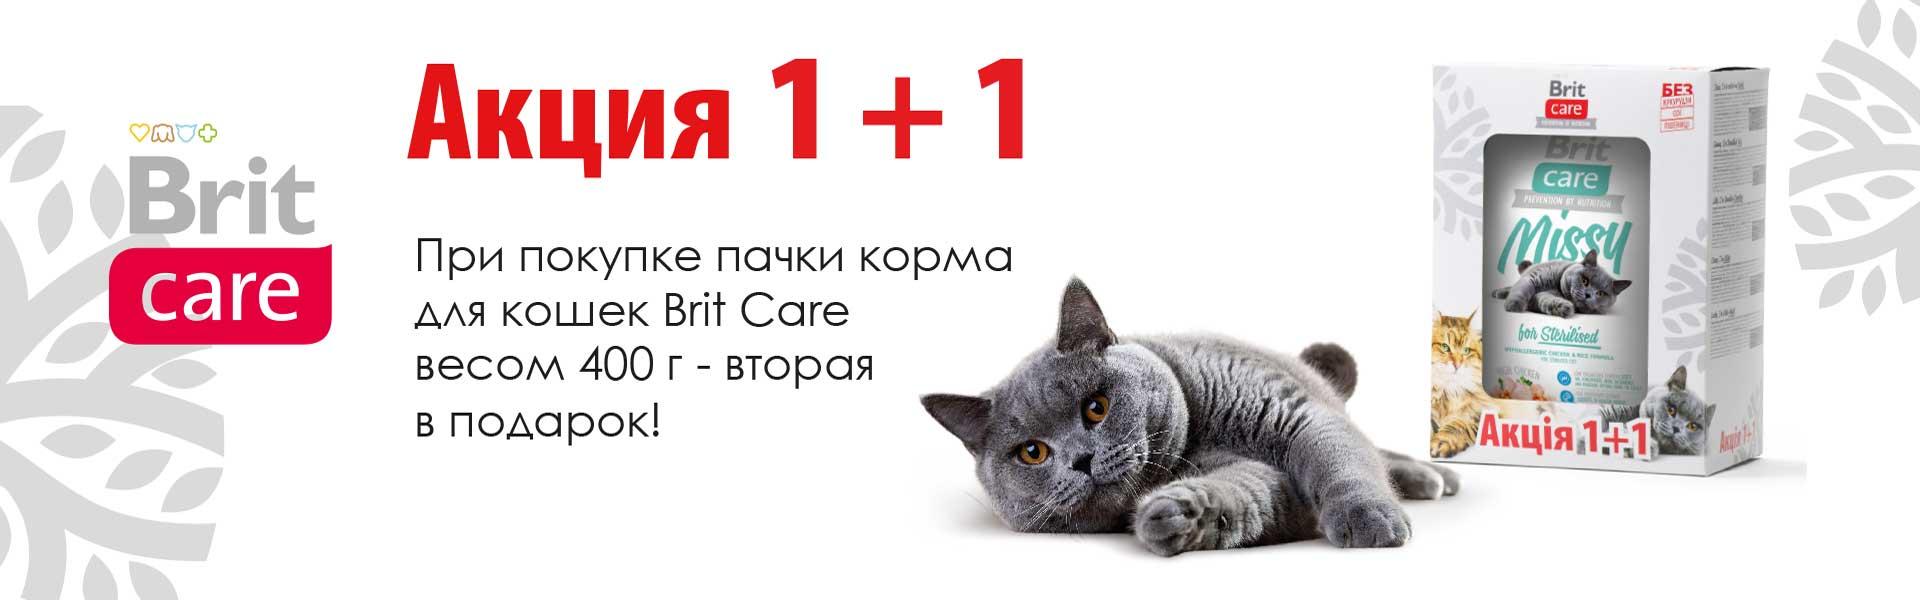 Brit Care акция